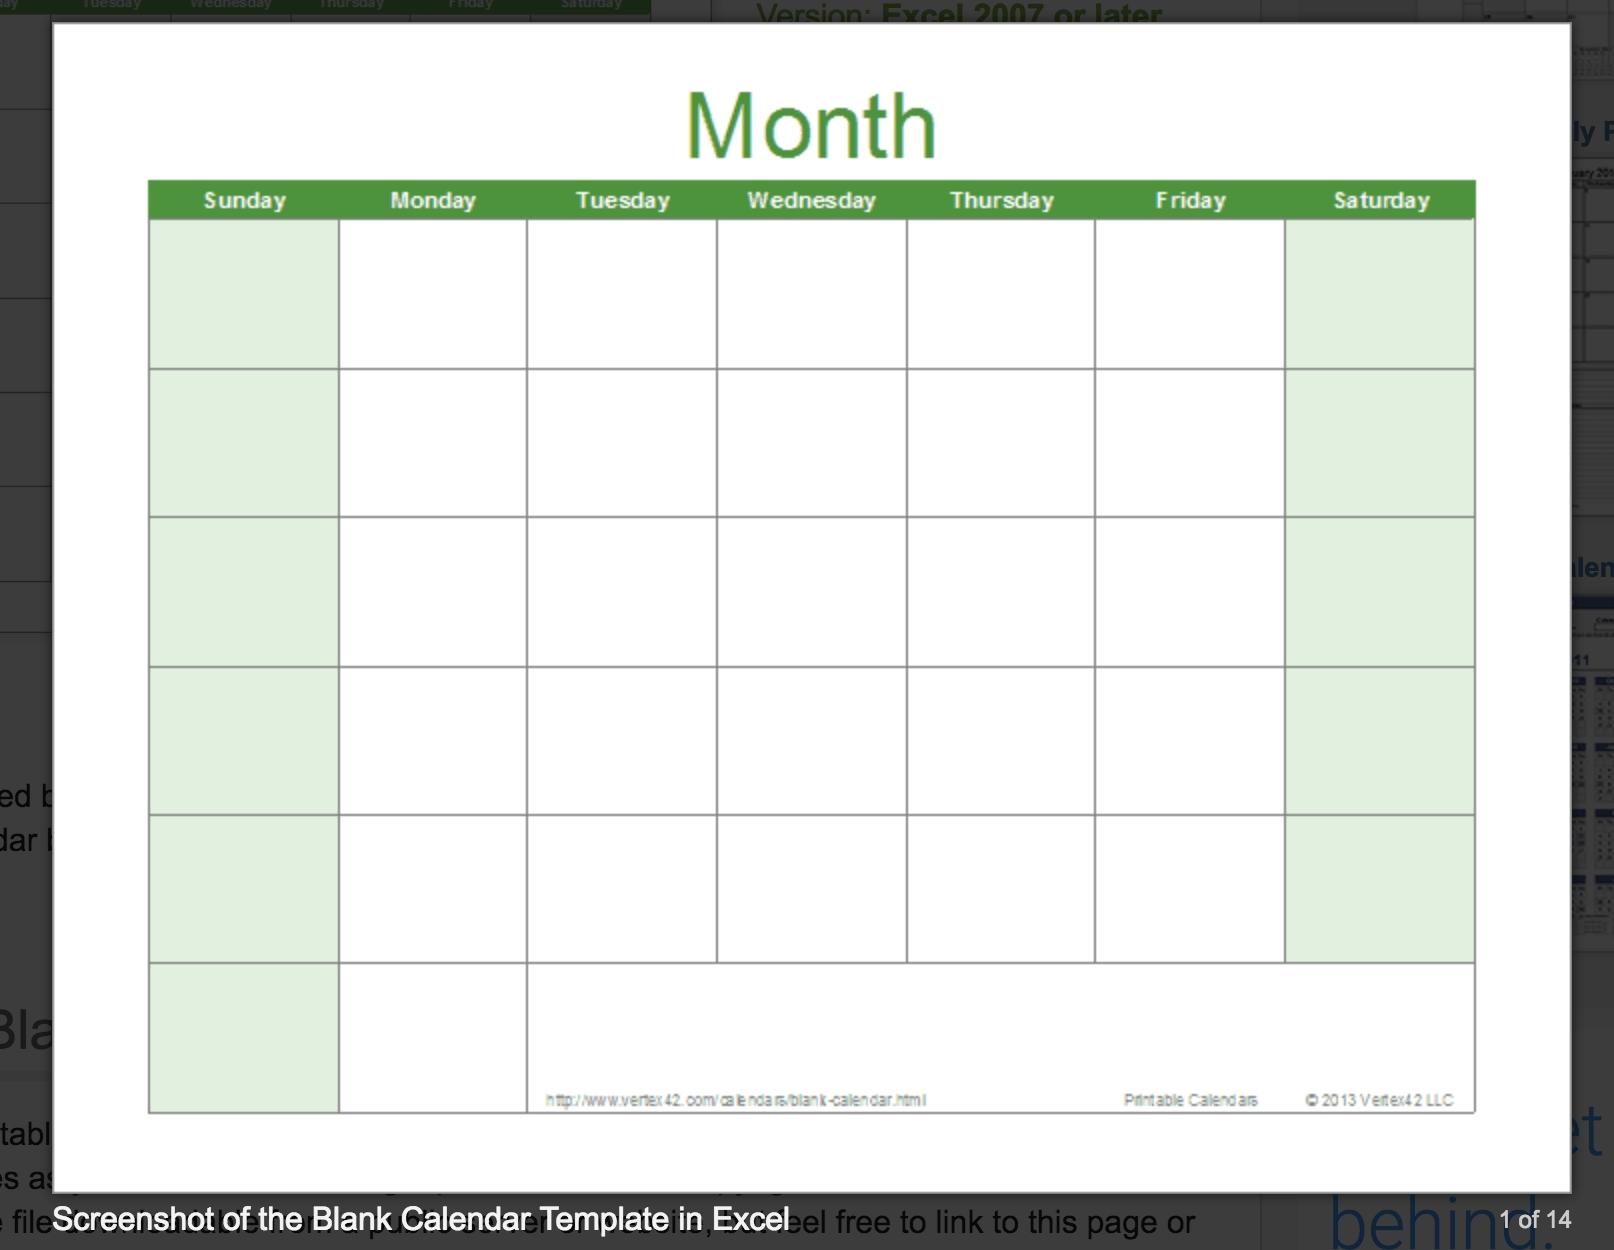 Blank Calendar: Wonderfully Printable 2019 Templates  Printable Full Page Monthly Calendar Blank